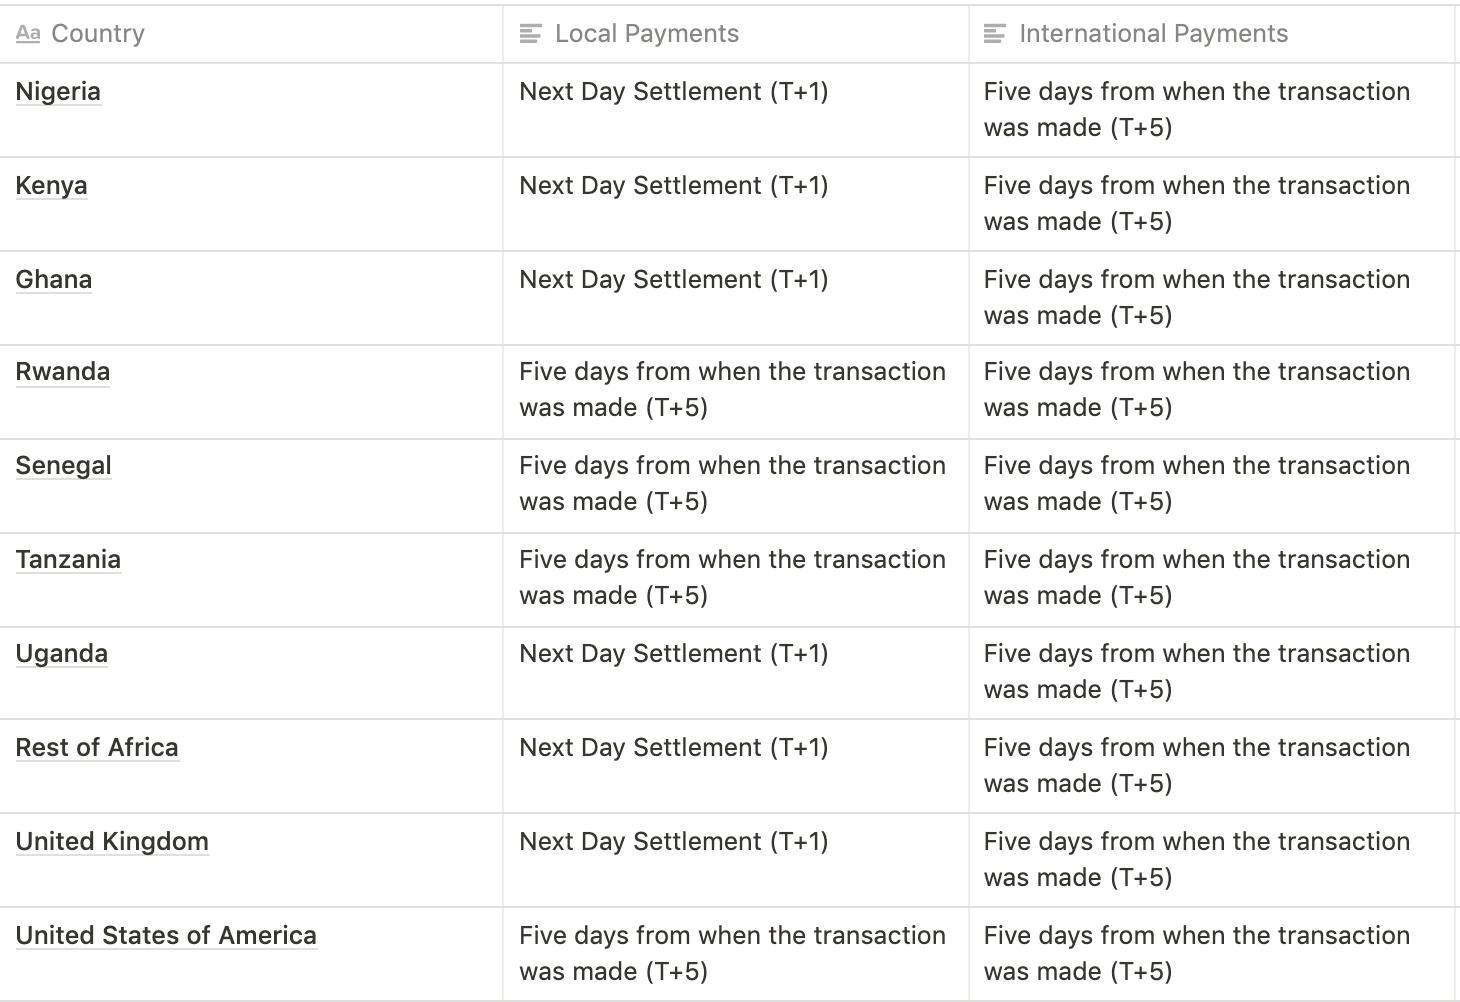 Flutterwave settlement schedule